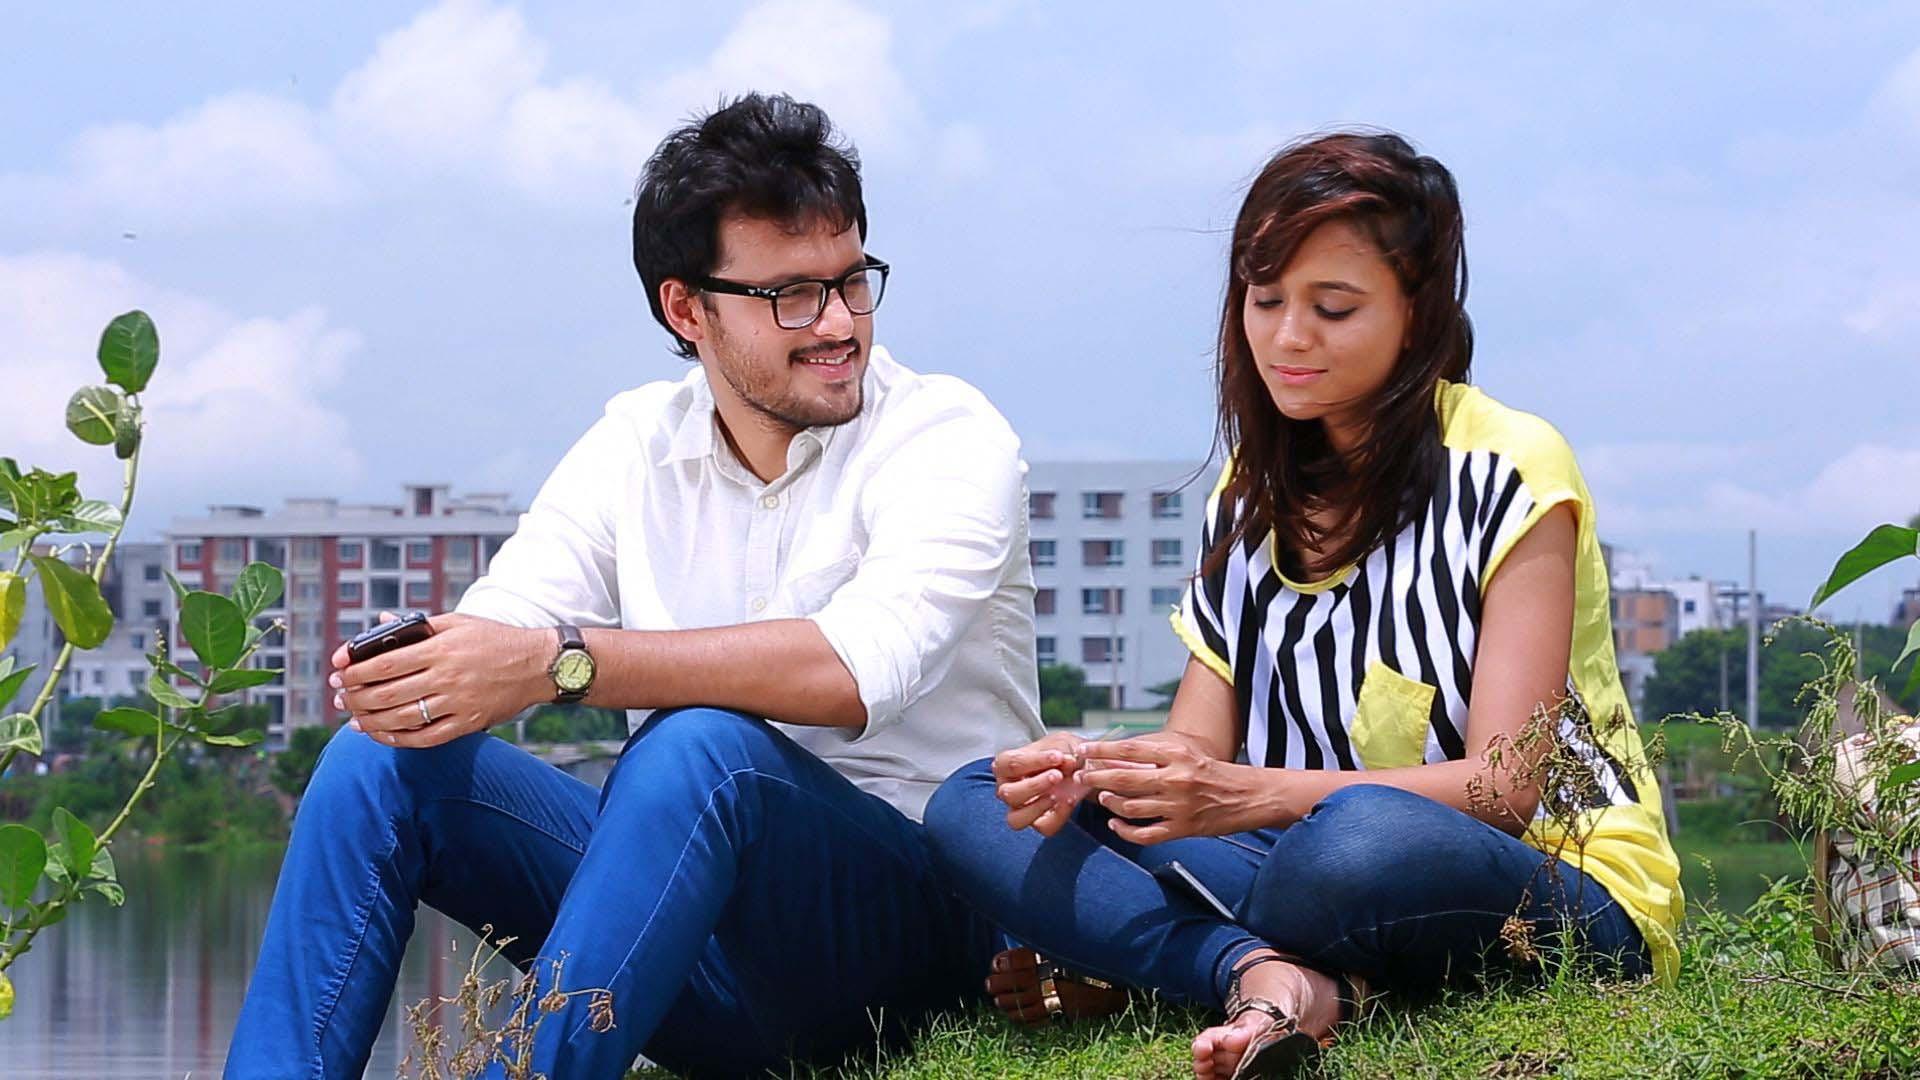 Kartik Aaryan's camaraderie  with Paresh Rawal